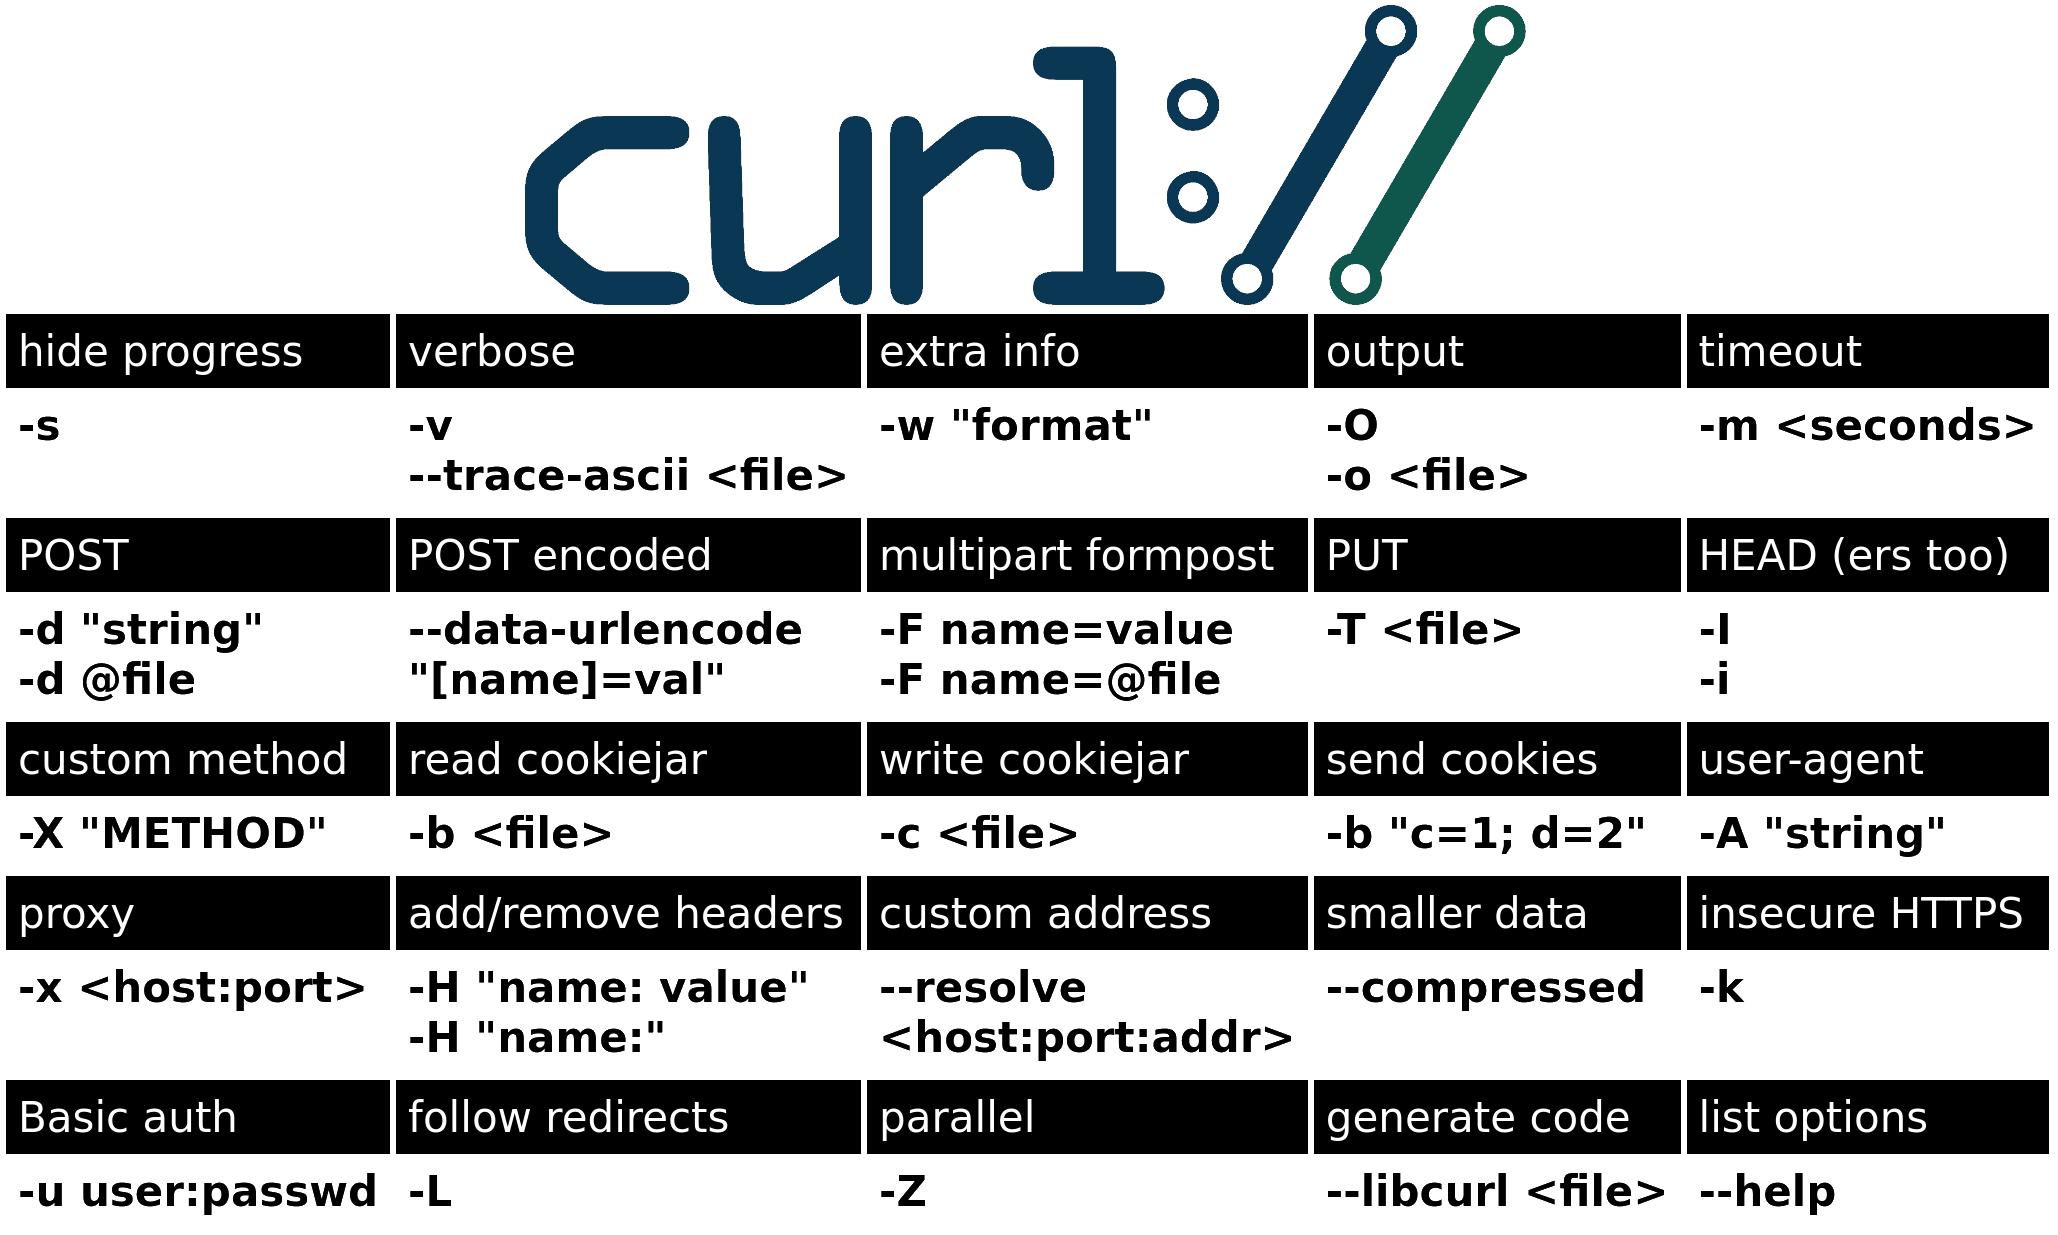 curl-cheat-sheet-fedorafans.com